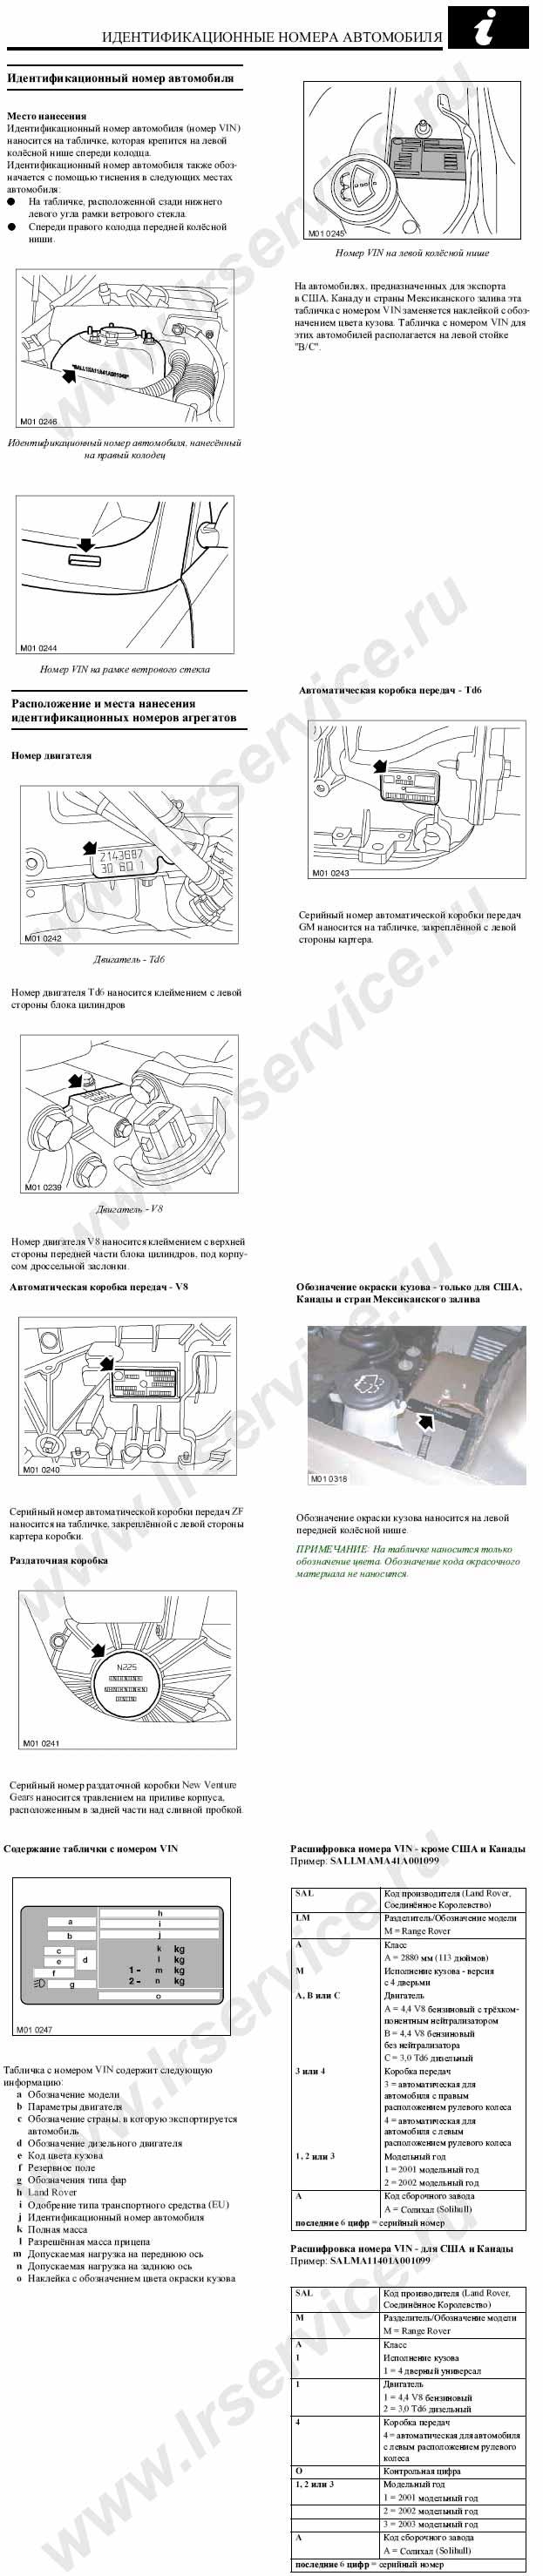 Номер двигателя Range Rover